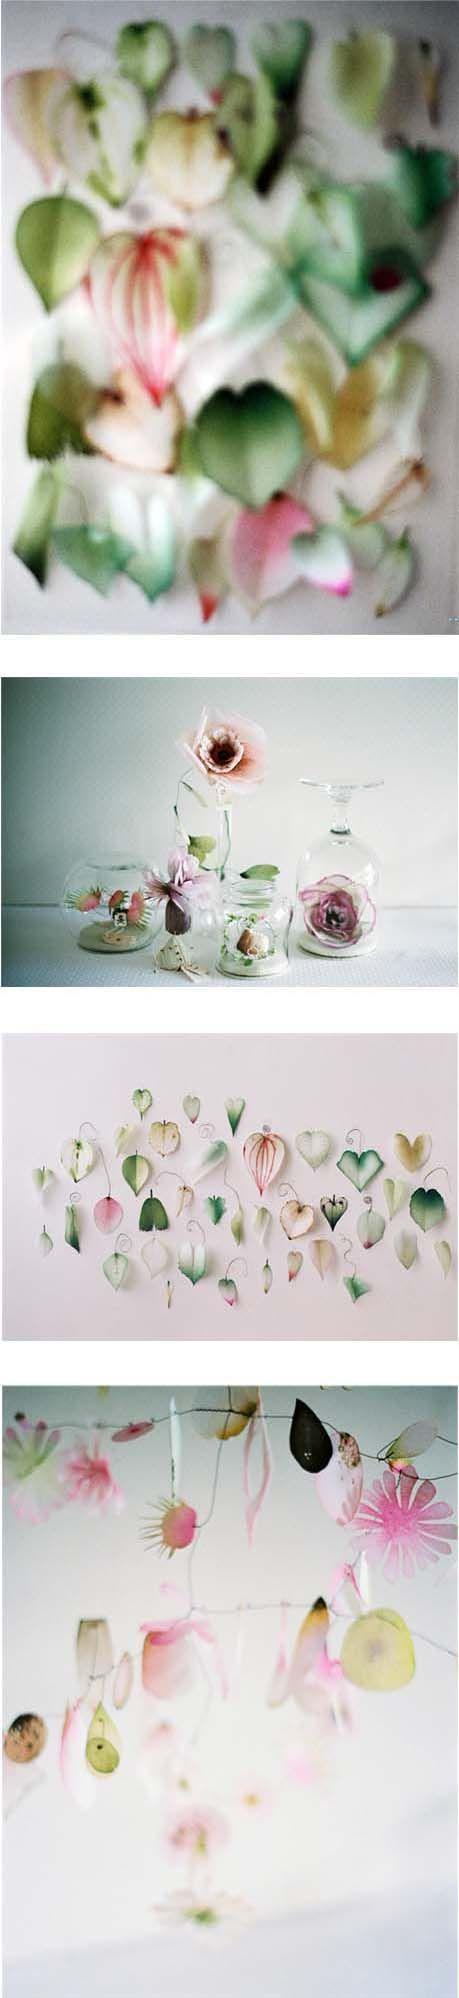 Fleurs Lyndie Dourthe : lyndie.dourthe@orange.fr